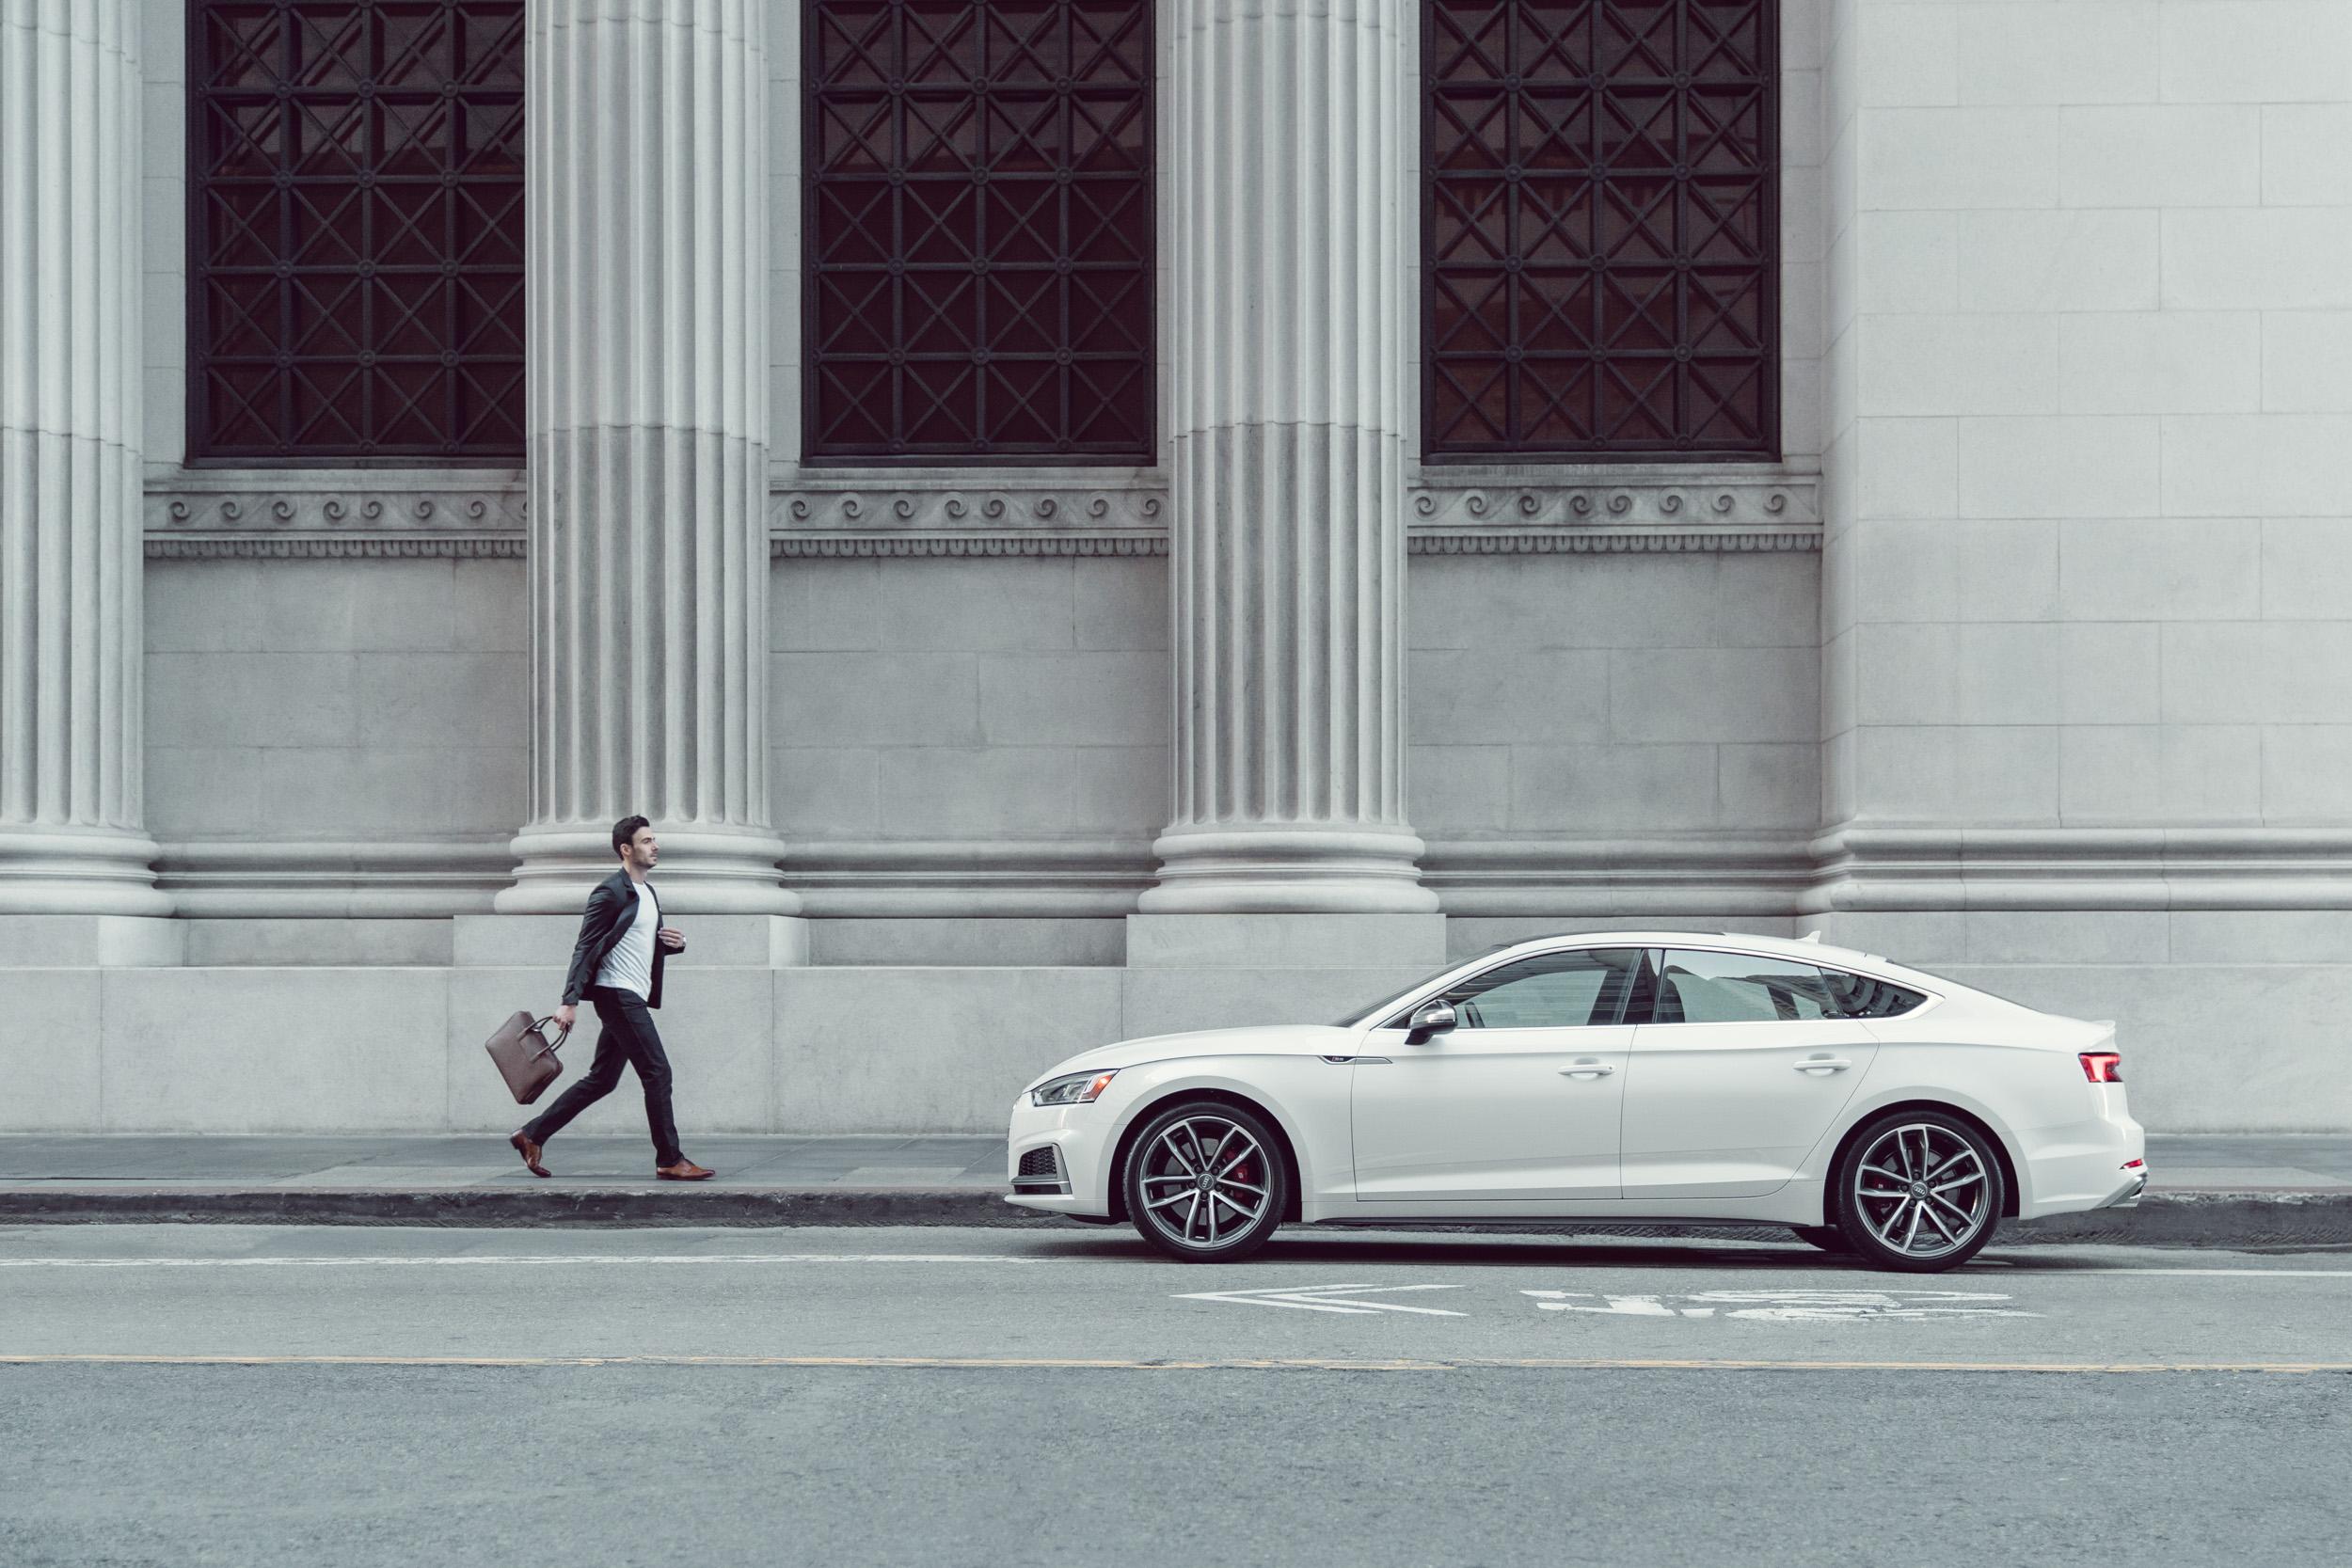 Objktv_SQ_OBJKTV_MaxRes_Automotive_Audi_BAX8127 (1).jpg